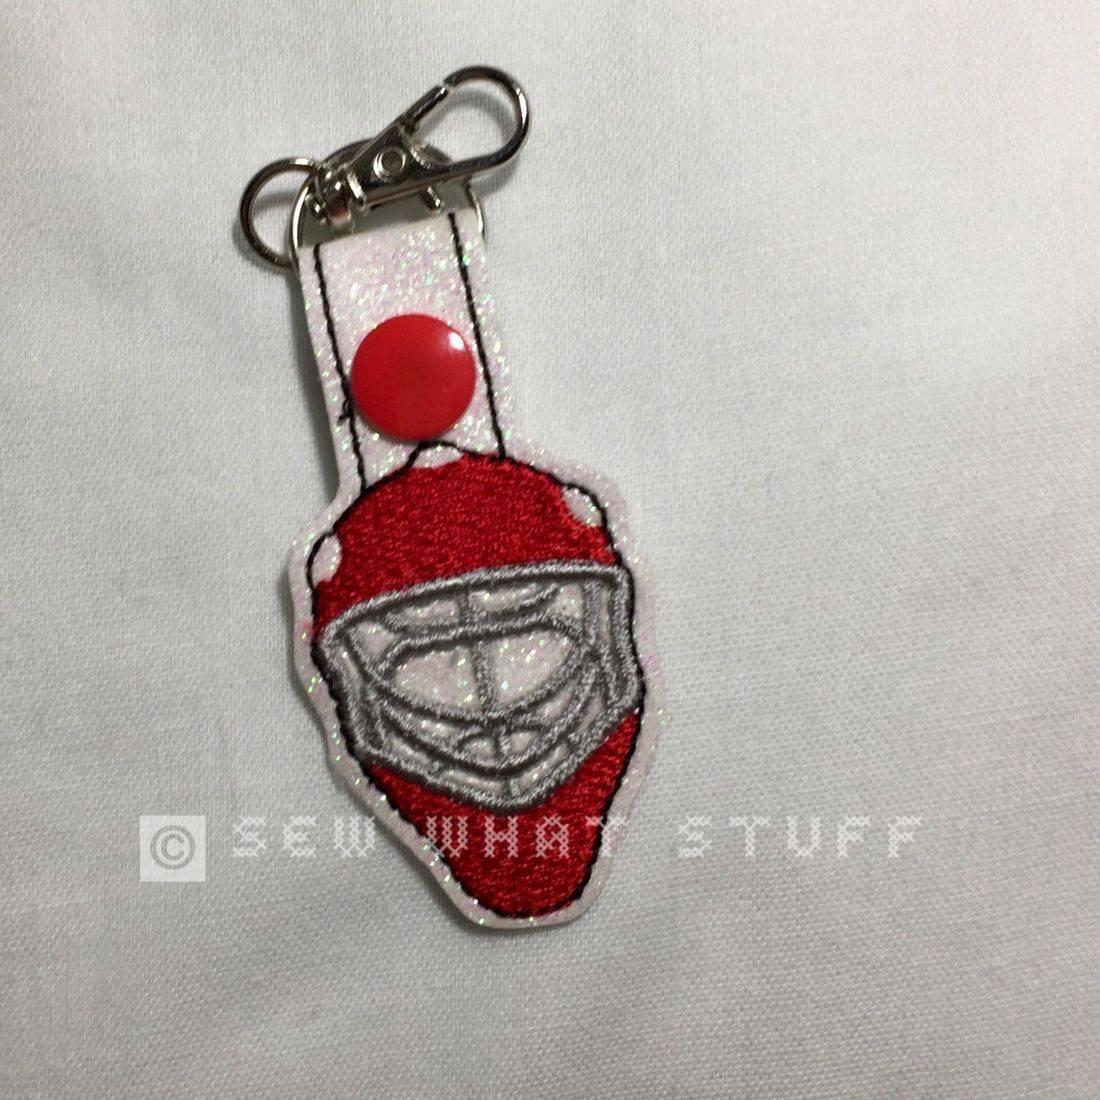 Goalie Key Tag/Zipper Pull